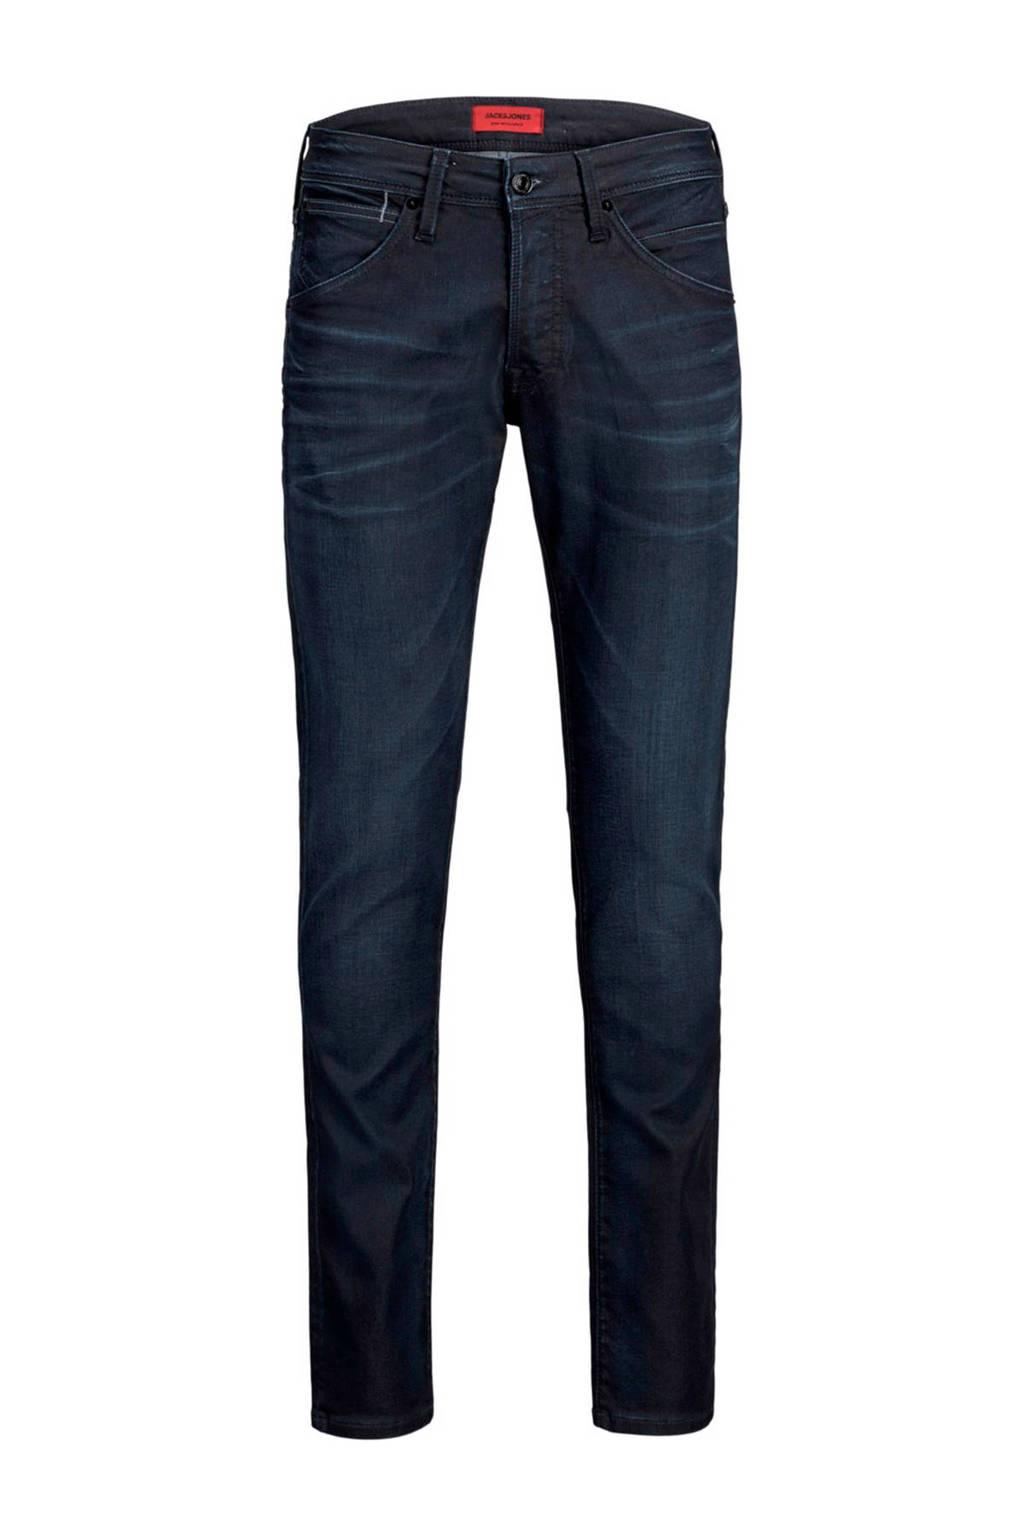 JACK & JONES JEANS INTELLIGENCE regular fit jeans donkerblauw, Donkerblauw